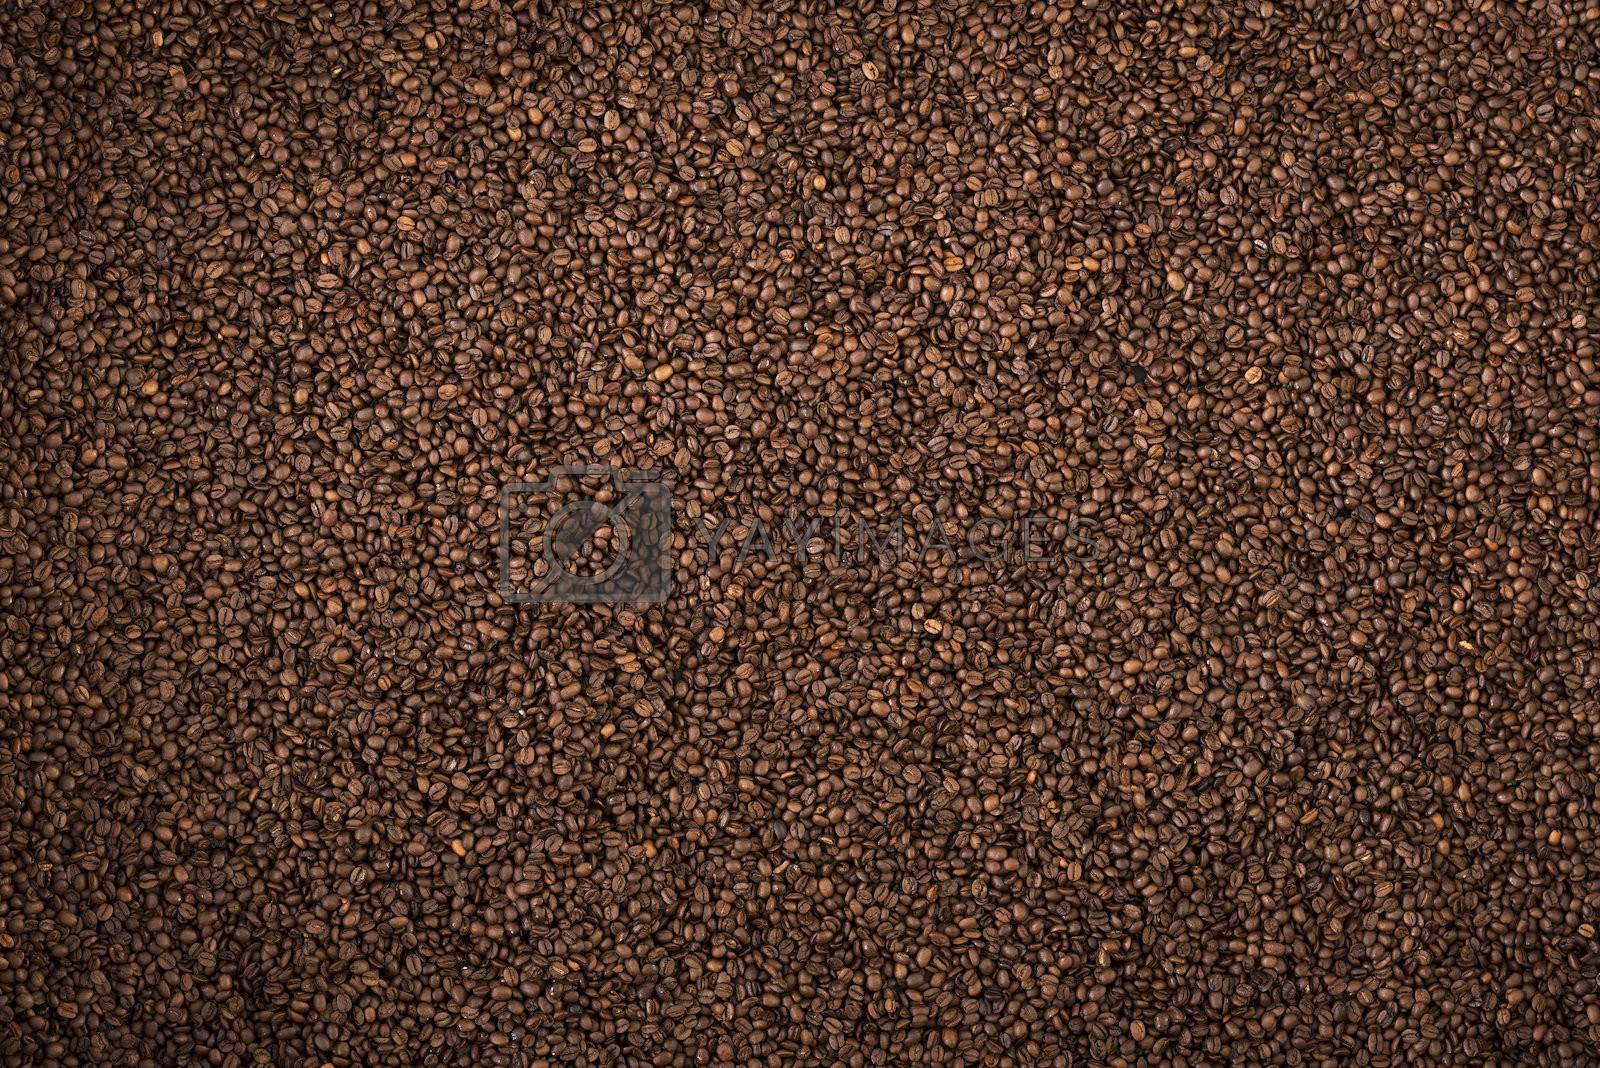 Coffee brown roasted grains texture